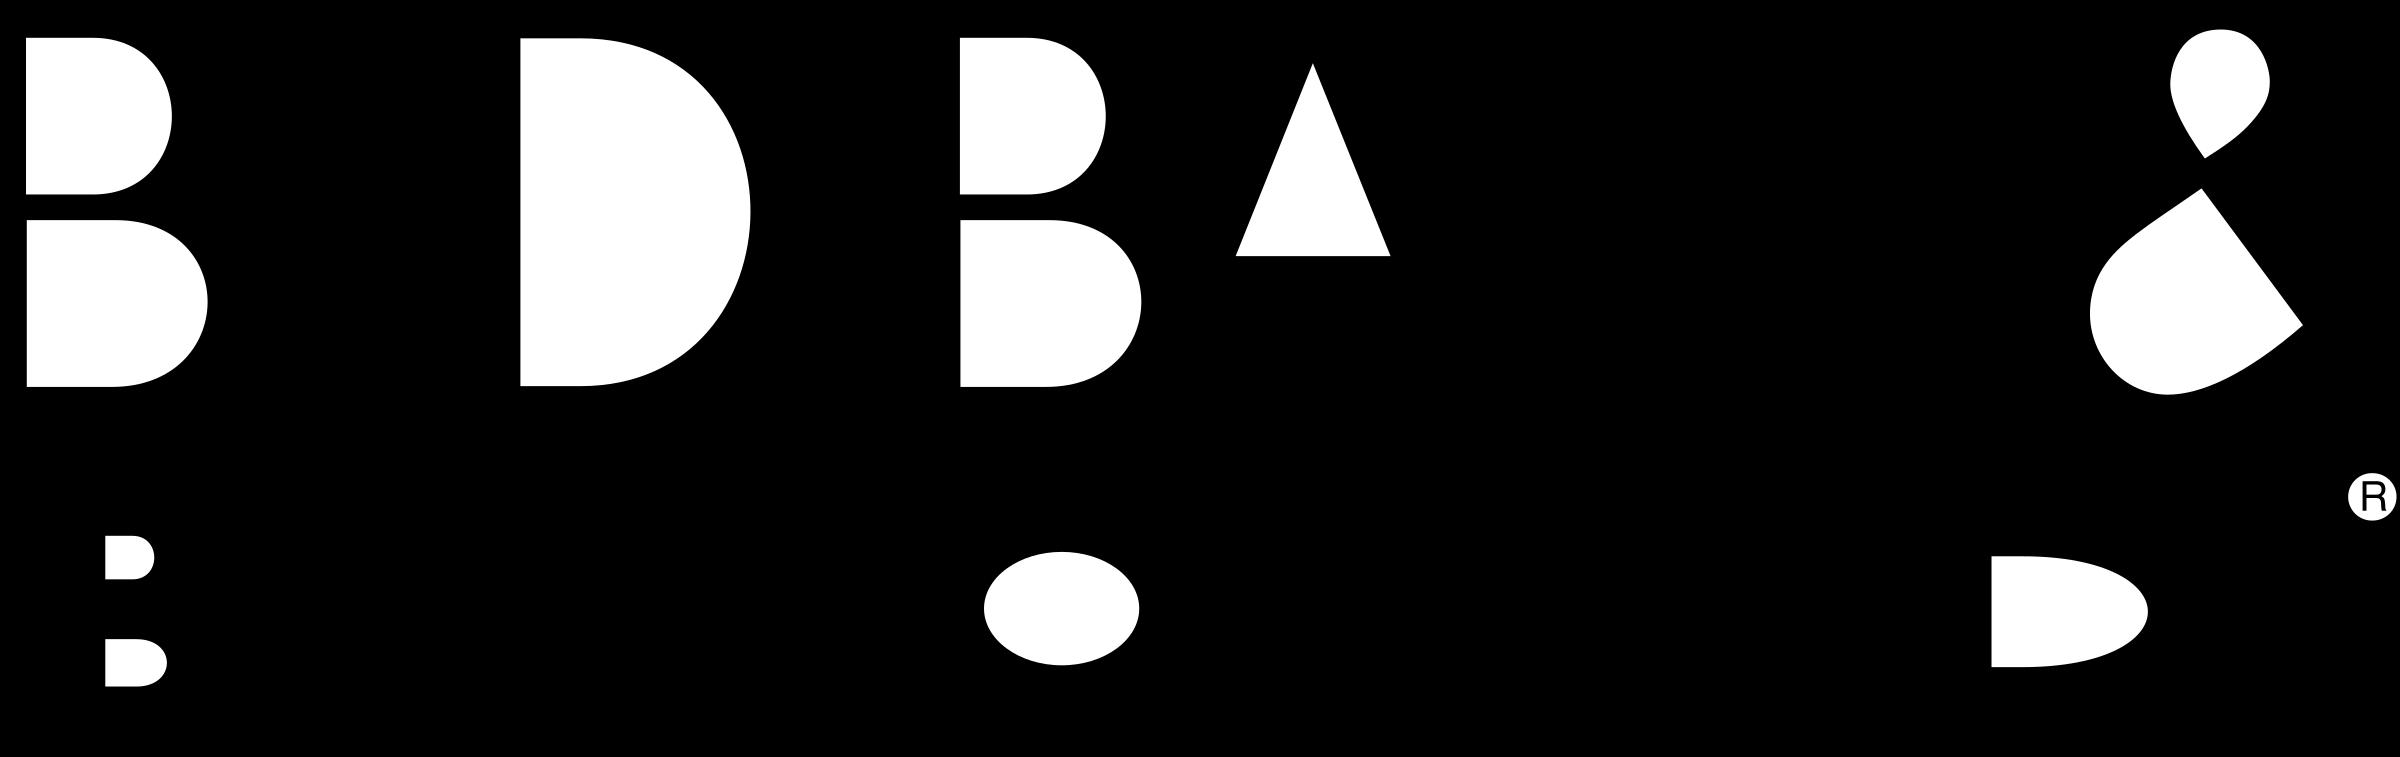 Bed Bath and Beyond Logo PNG Transparent & SVG Vector.